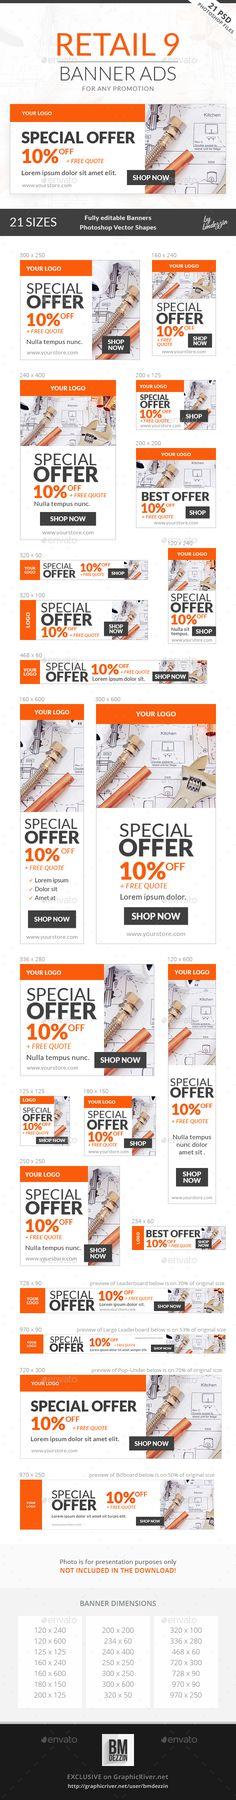 Retail Web Banner Ads Template PSD #design Download: http://graphicriver.net/item/retail-9-banner-ads/13590561?ref=ksioks